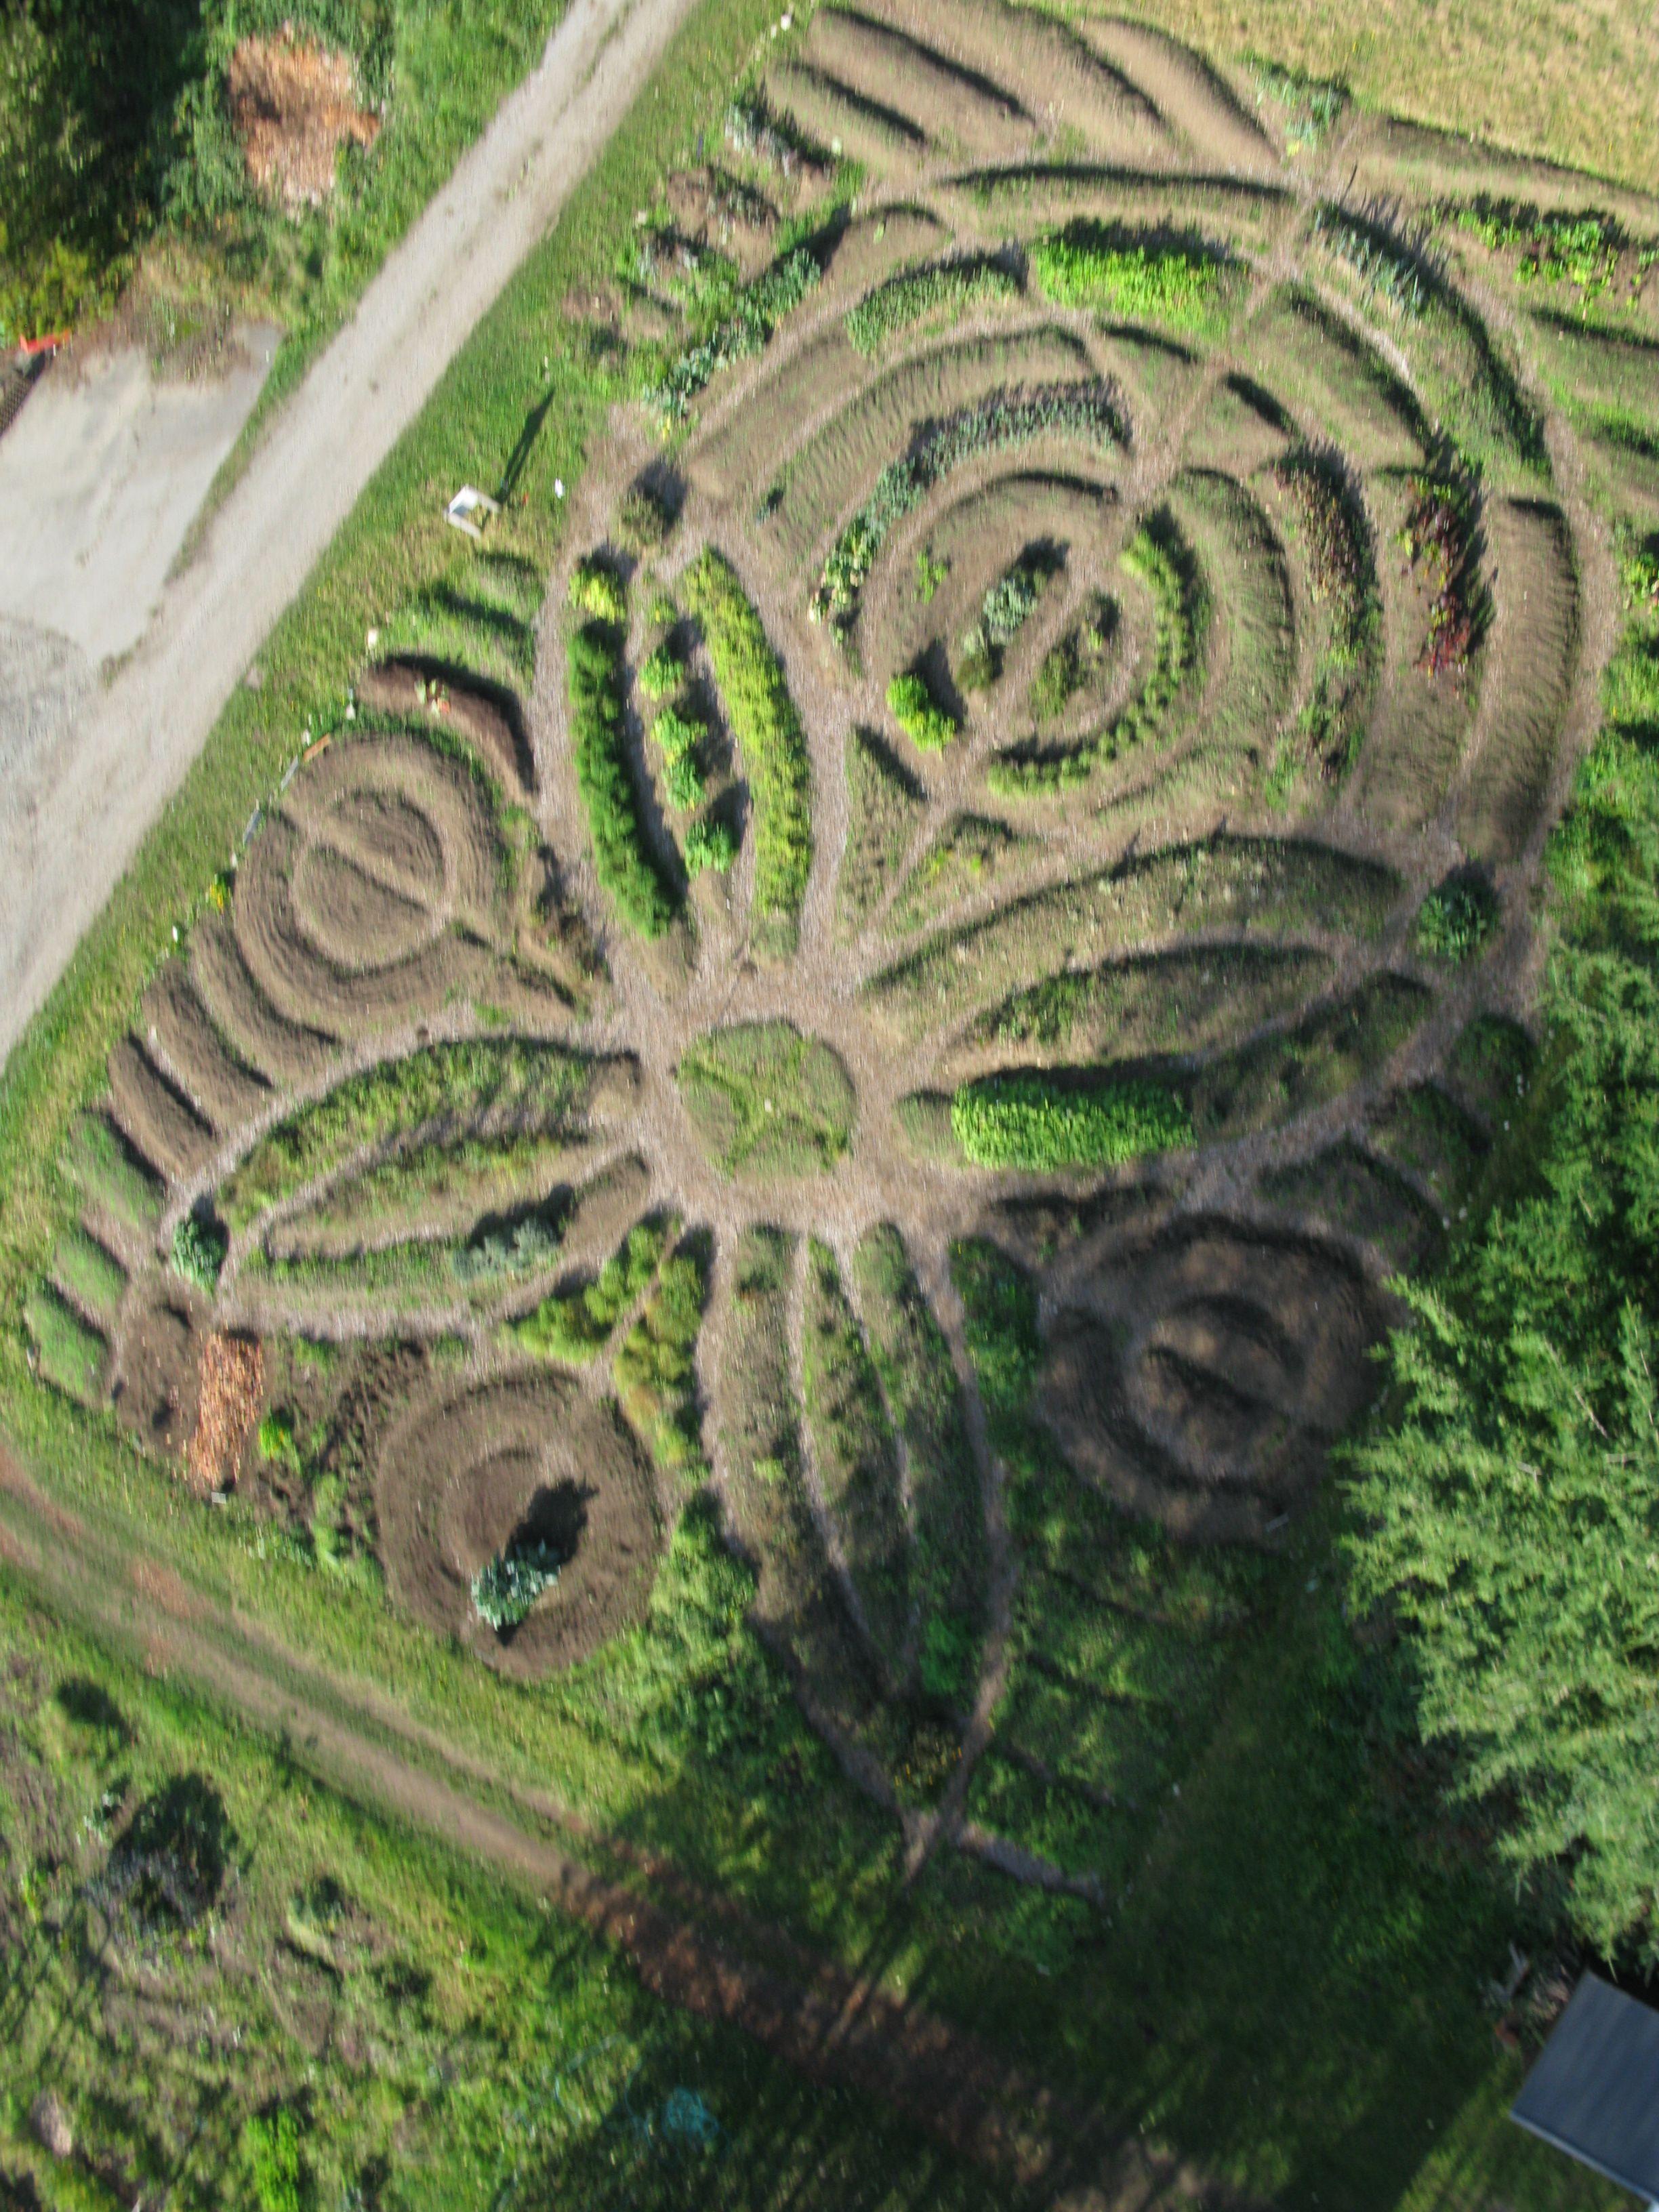 indigenous-health-garden-ubc-farm